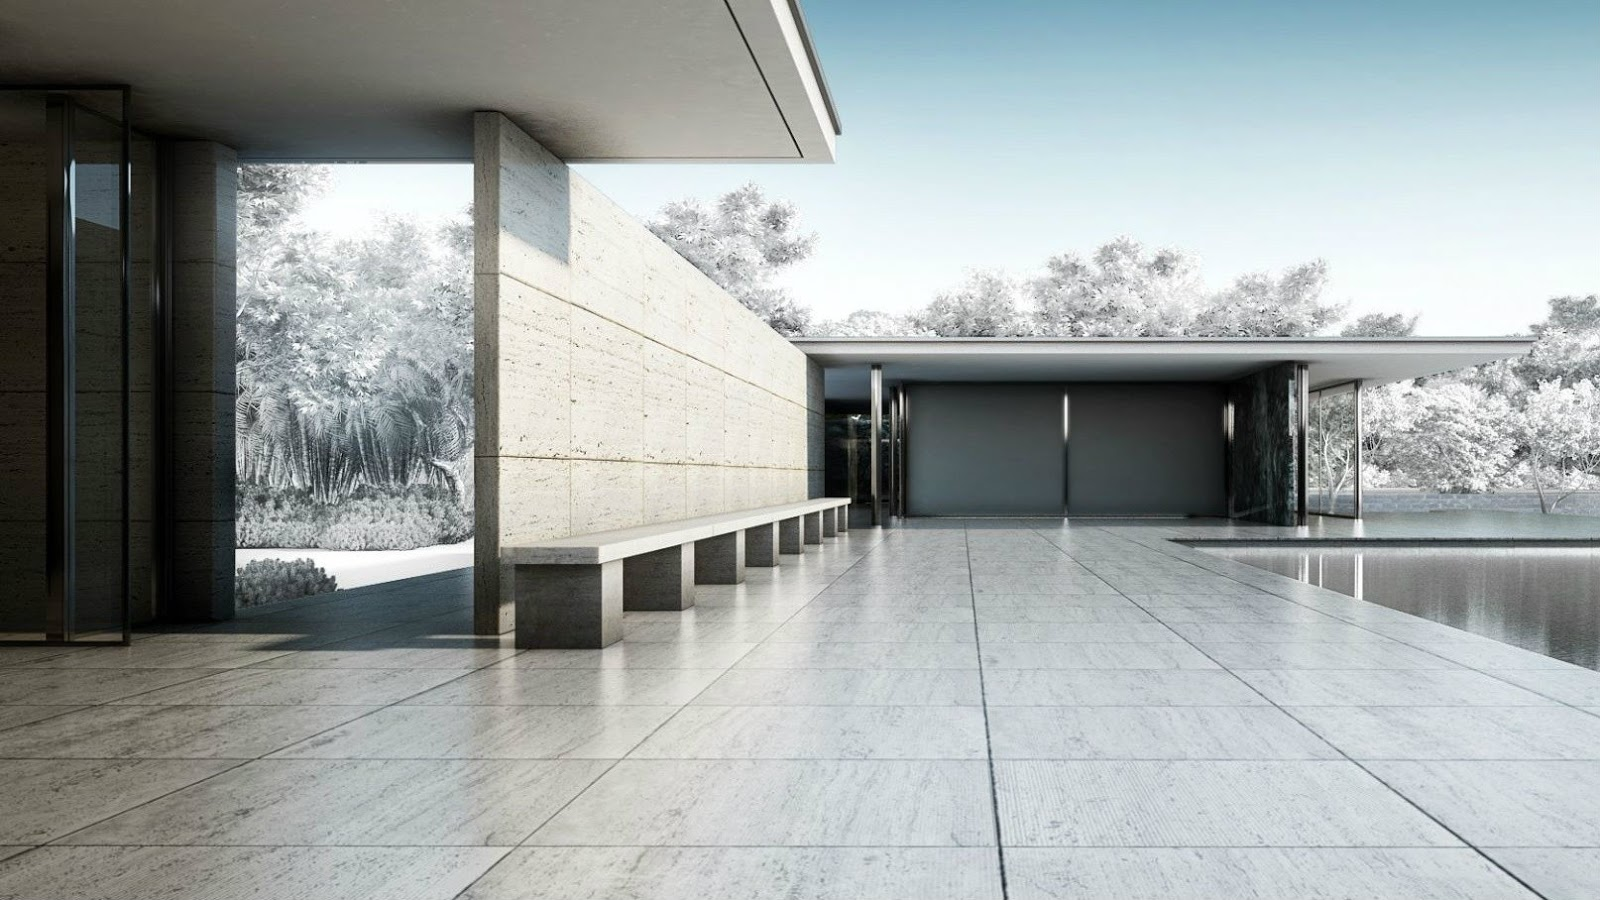 14 36 00 miscel neo for Tendencia minimalista arquitectura